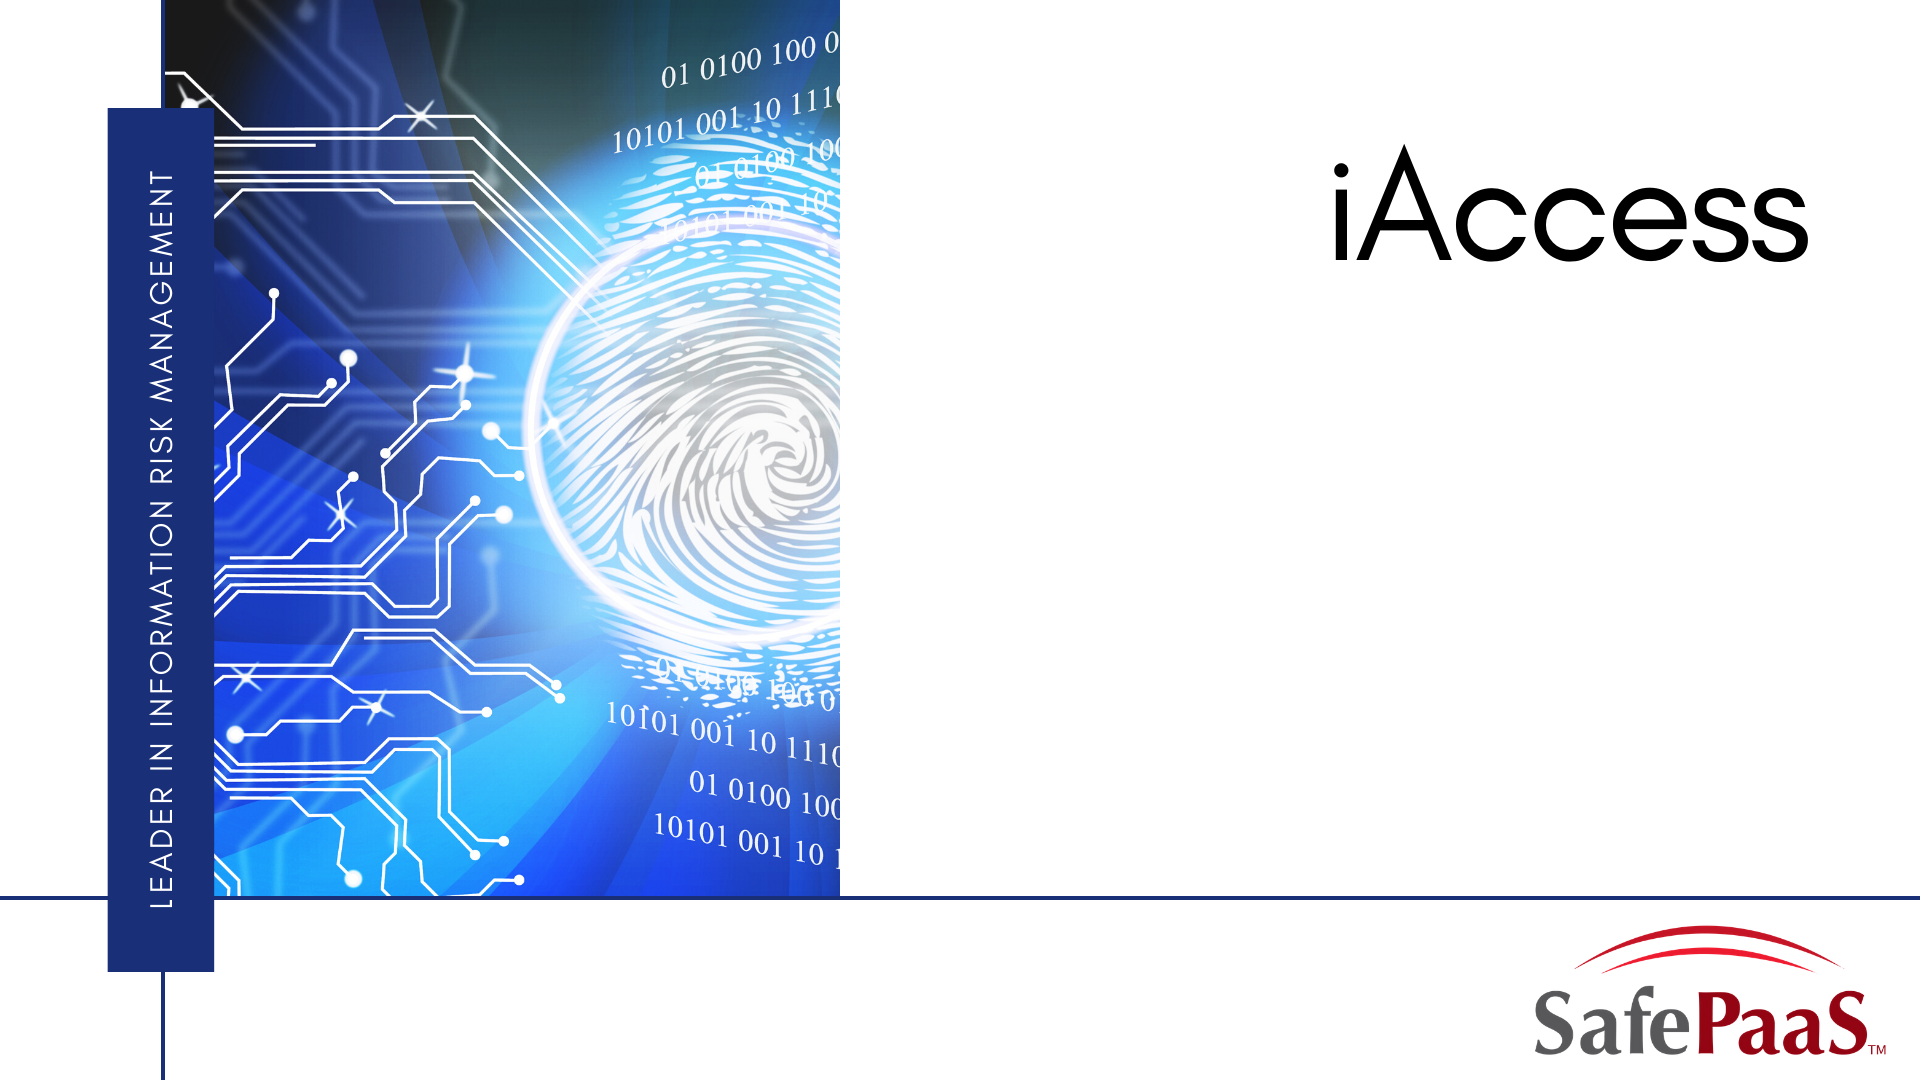 iAccess